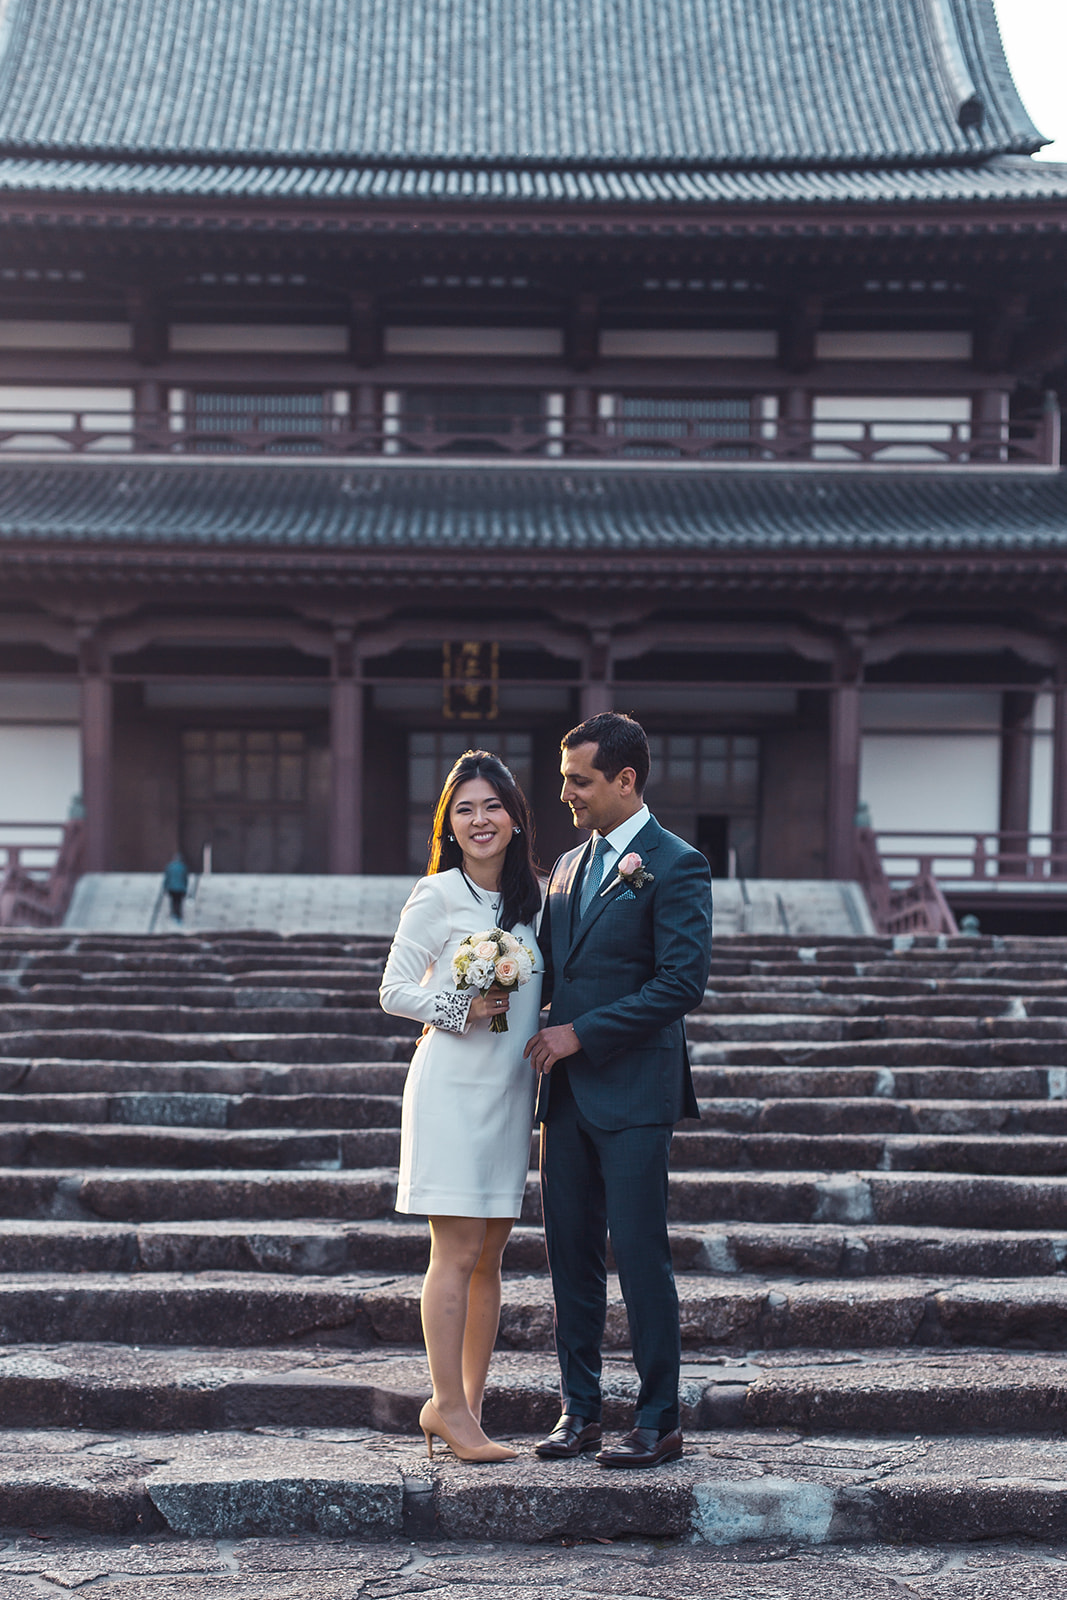 Prewedding pre wedding engagement in Tokyo Japan hire photographer (6).jpg